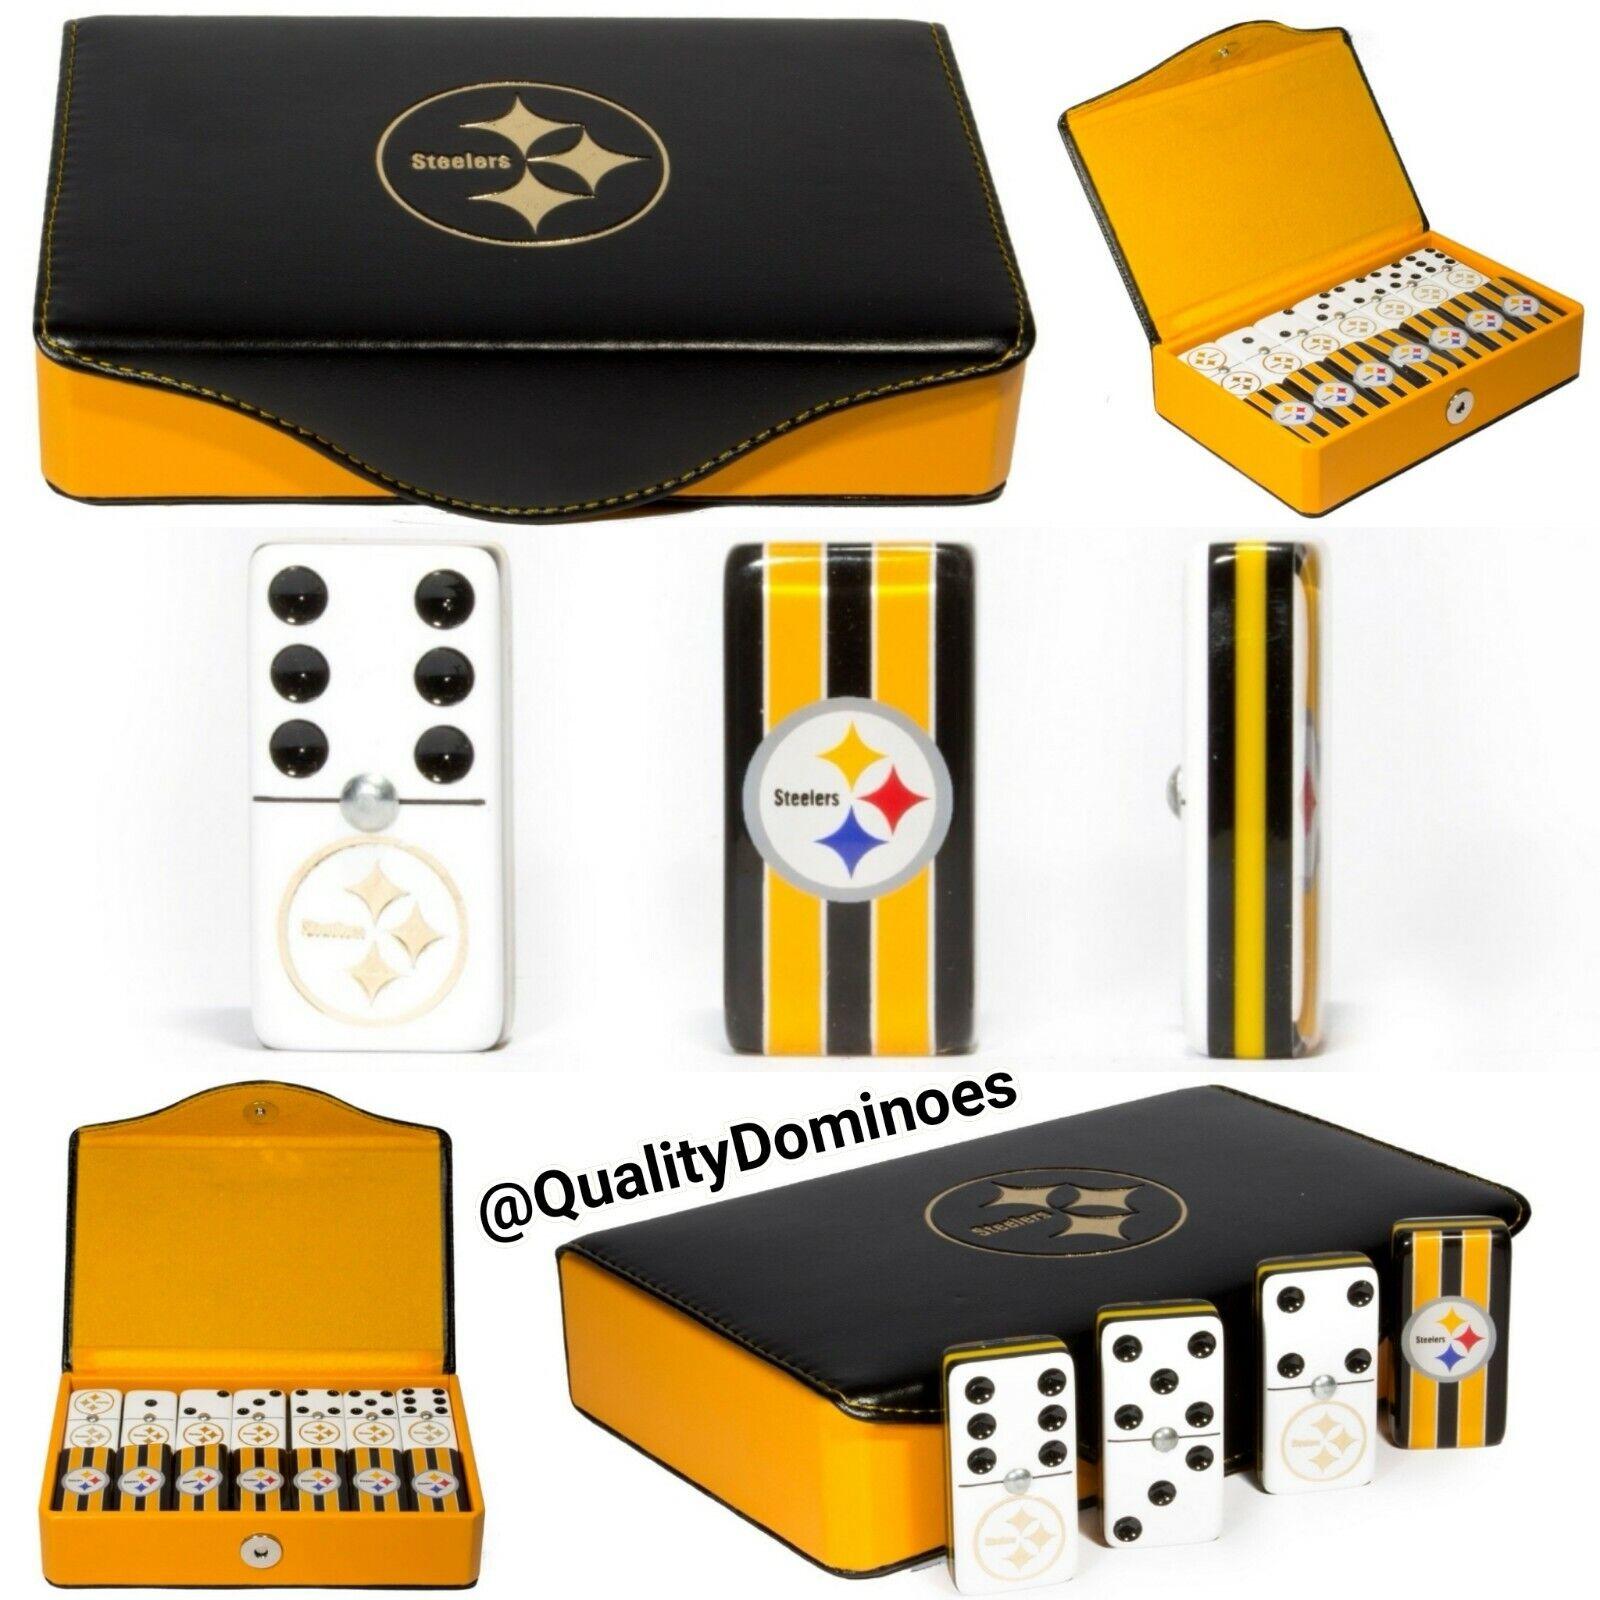 Pittsburgh Steelers Domino Game Set Jumbo Größe Great Hot Gift Dominoes Man Cave